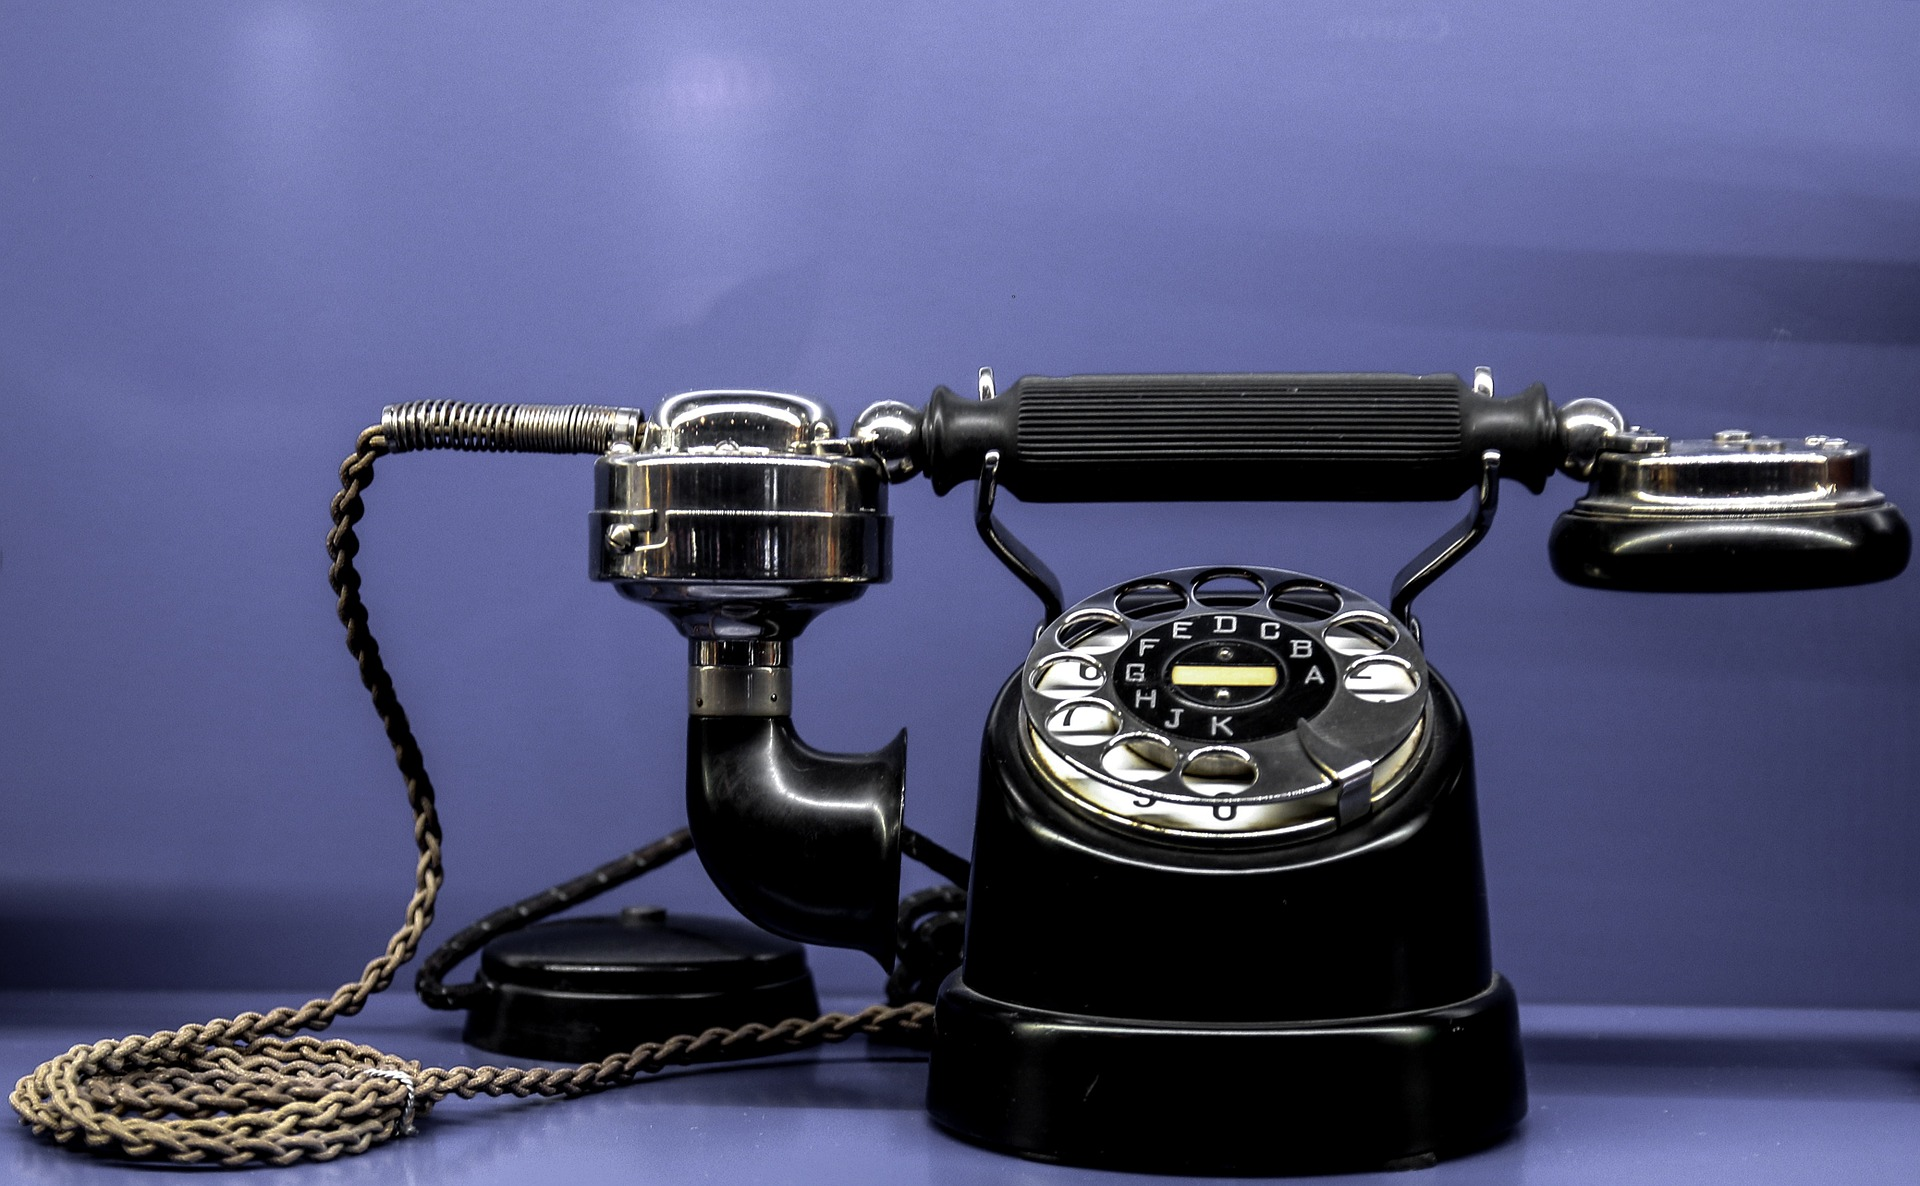 Jetnet teléfono fijo en el móvil